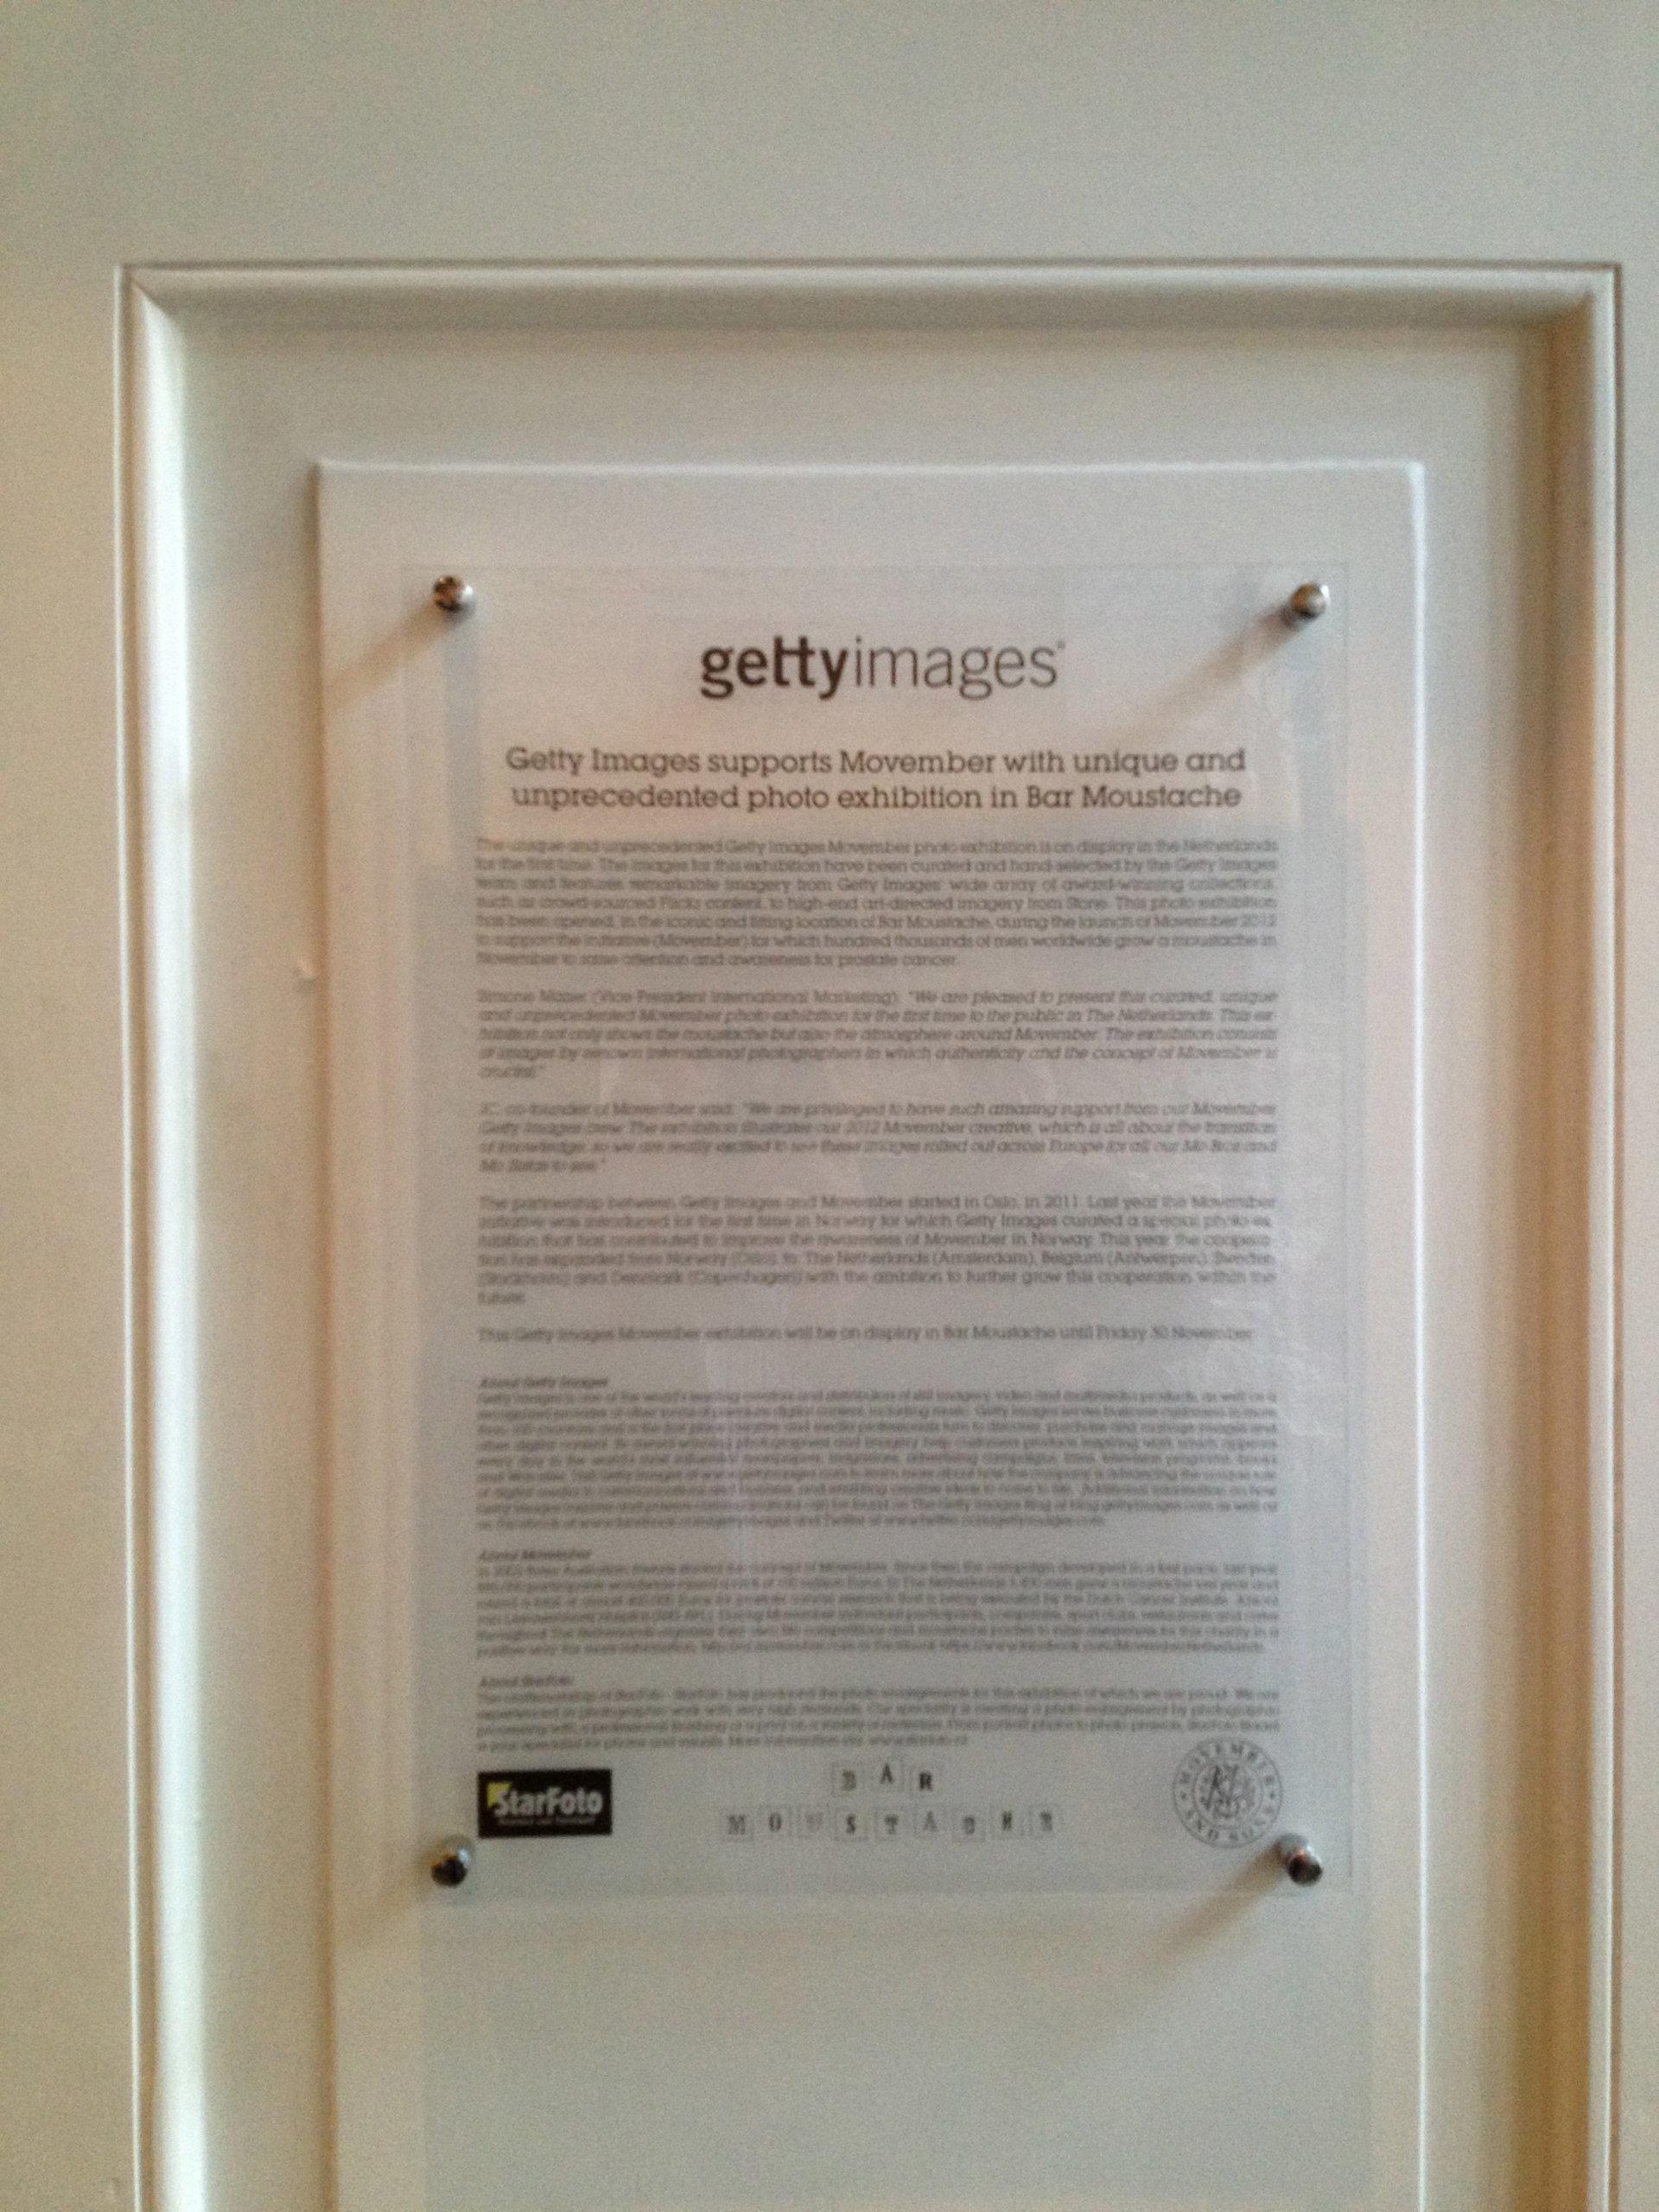 grootformaat prints_print op fotopapier-print op plaatmateriaal-fotografie-00